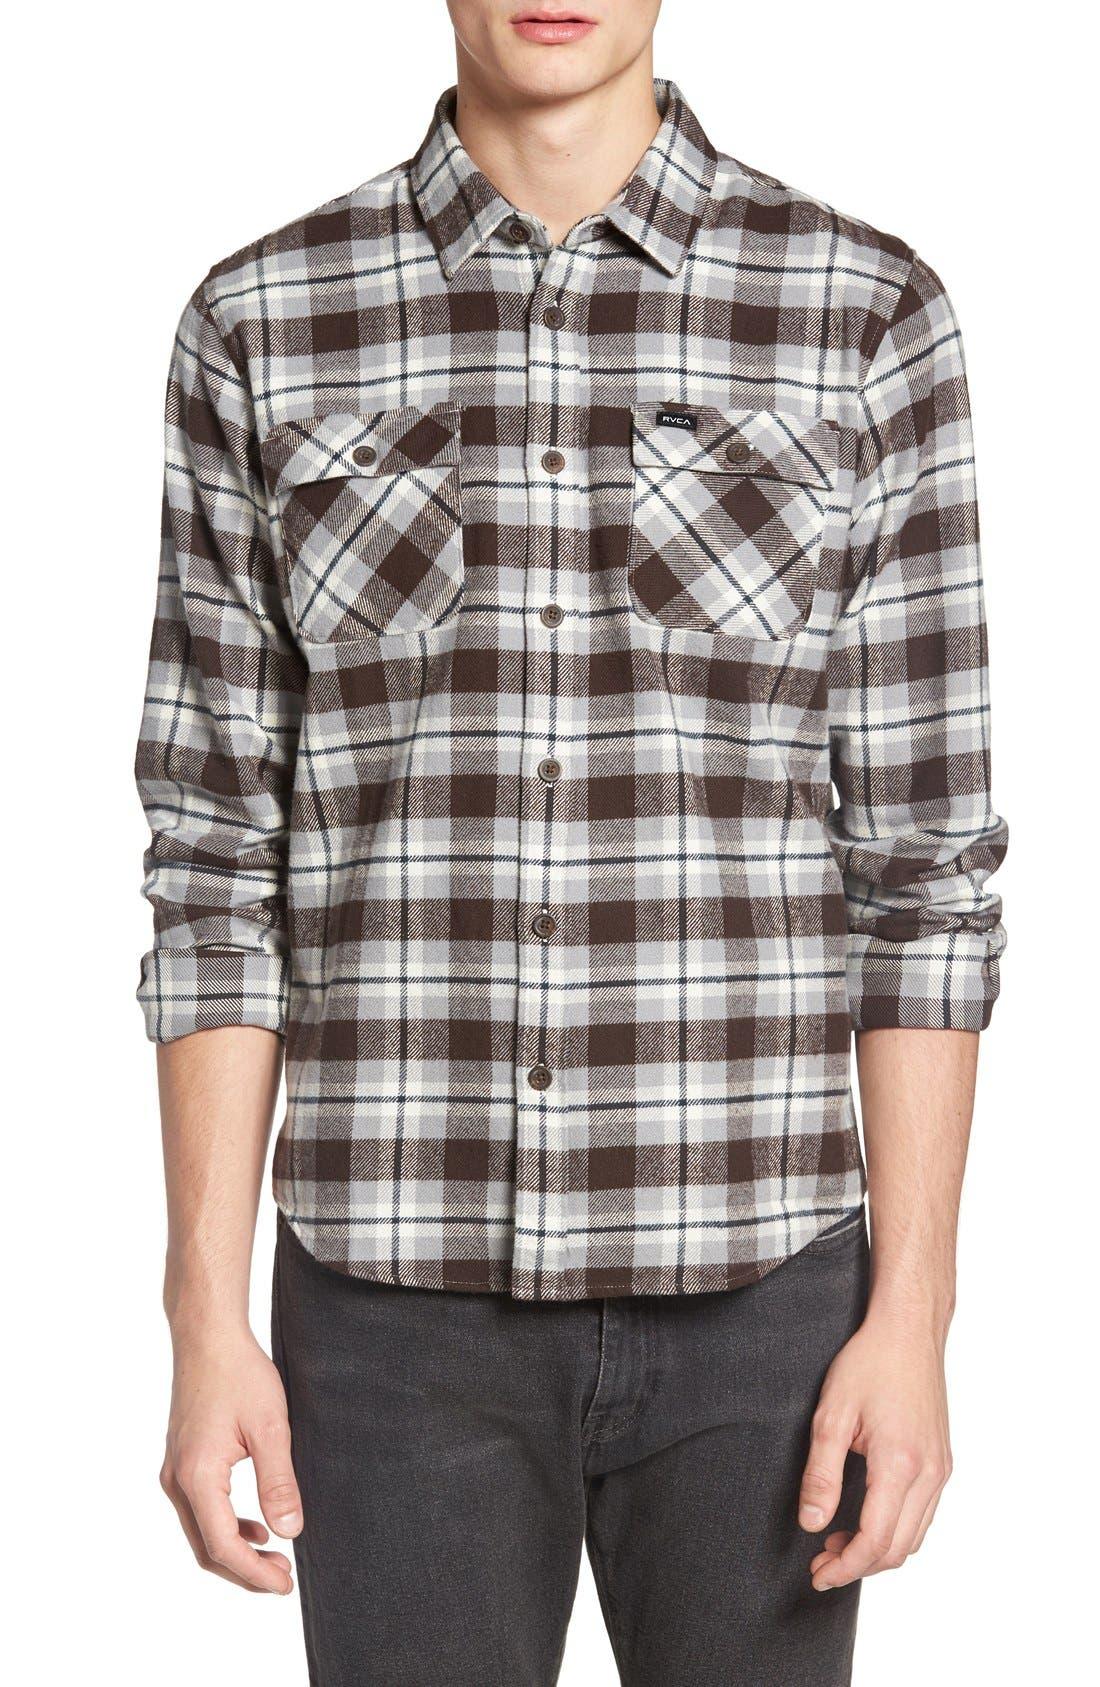 'That'll Work' Trim Fit Plaid Flannel Shirt,                             Main thumbnail 4, color,